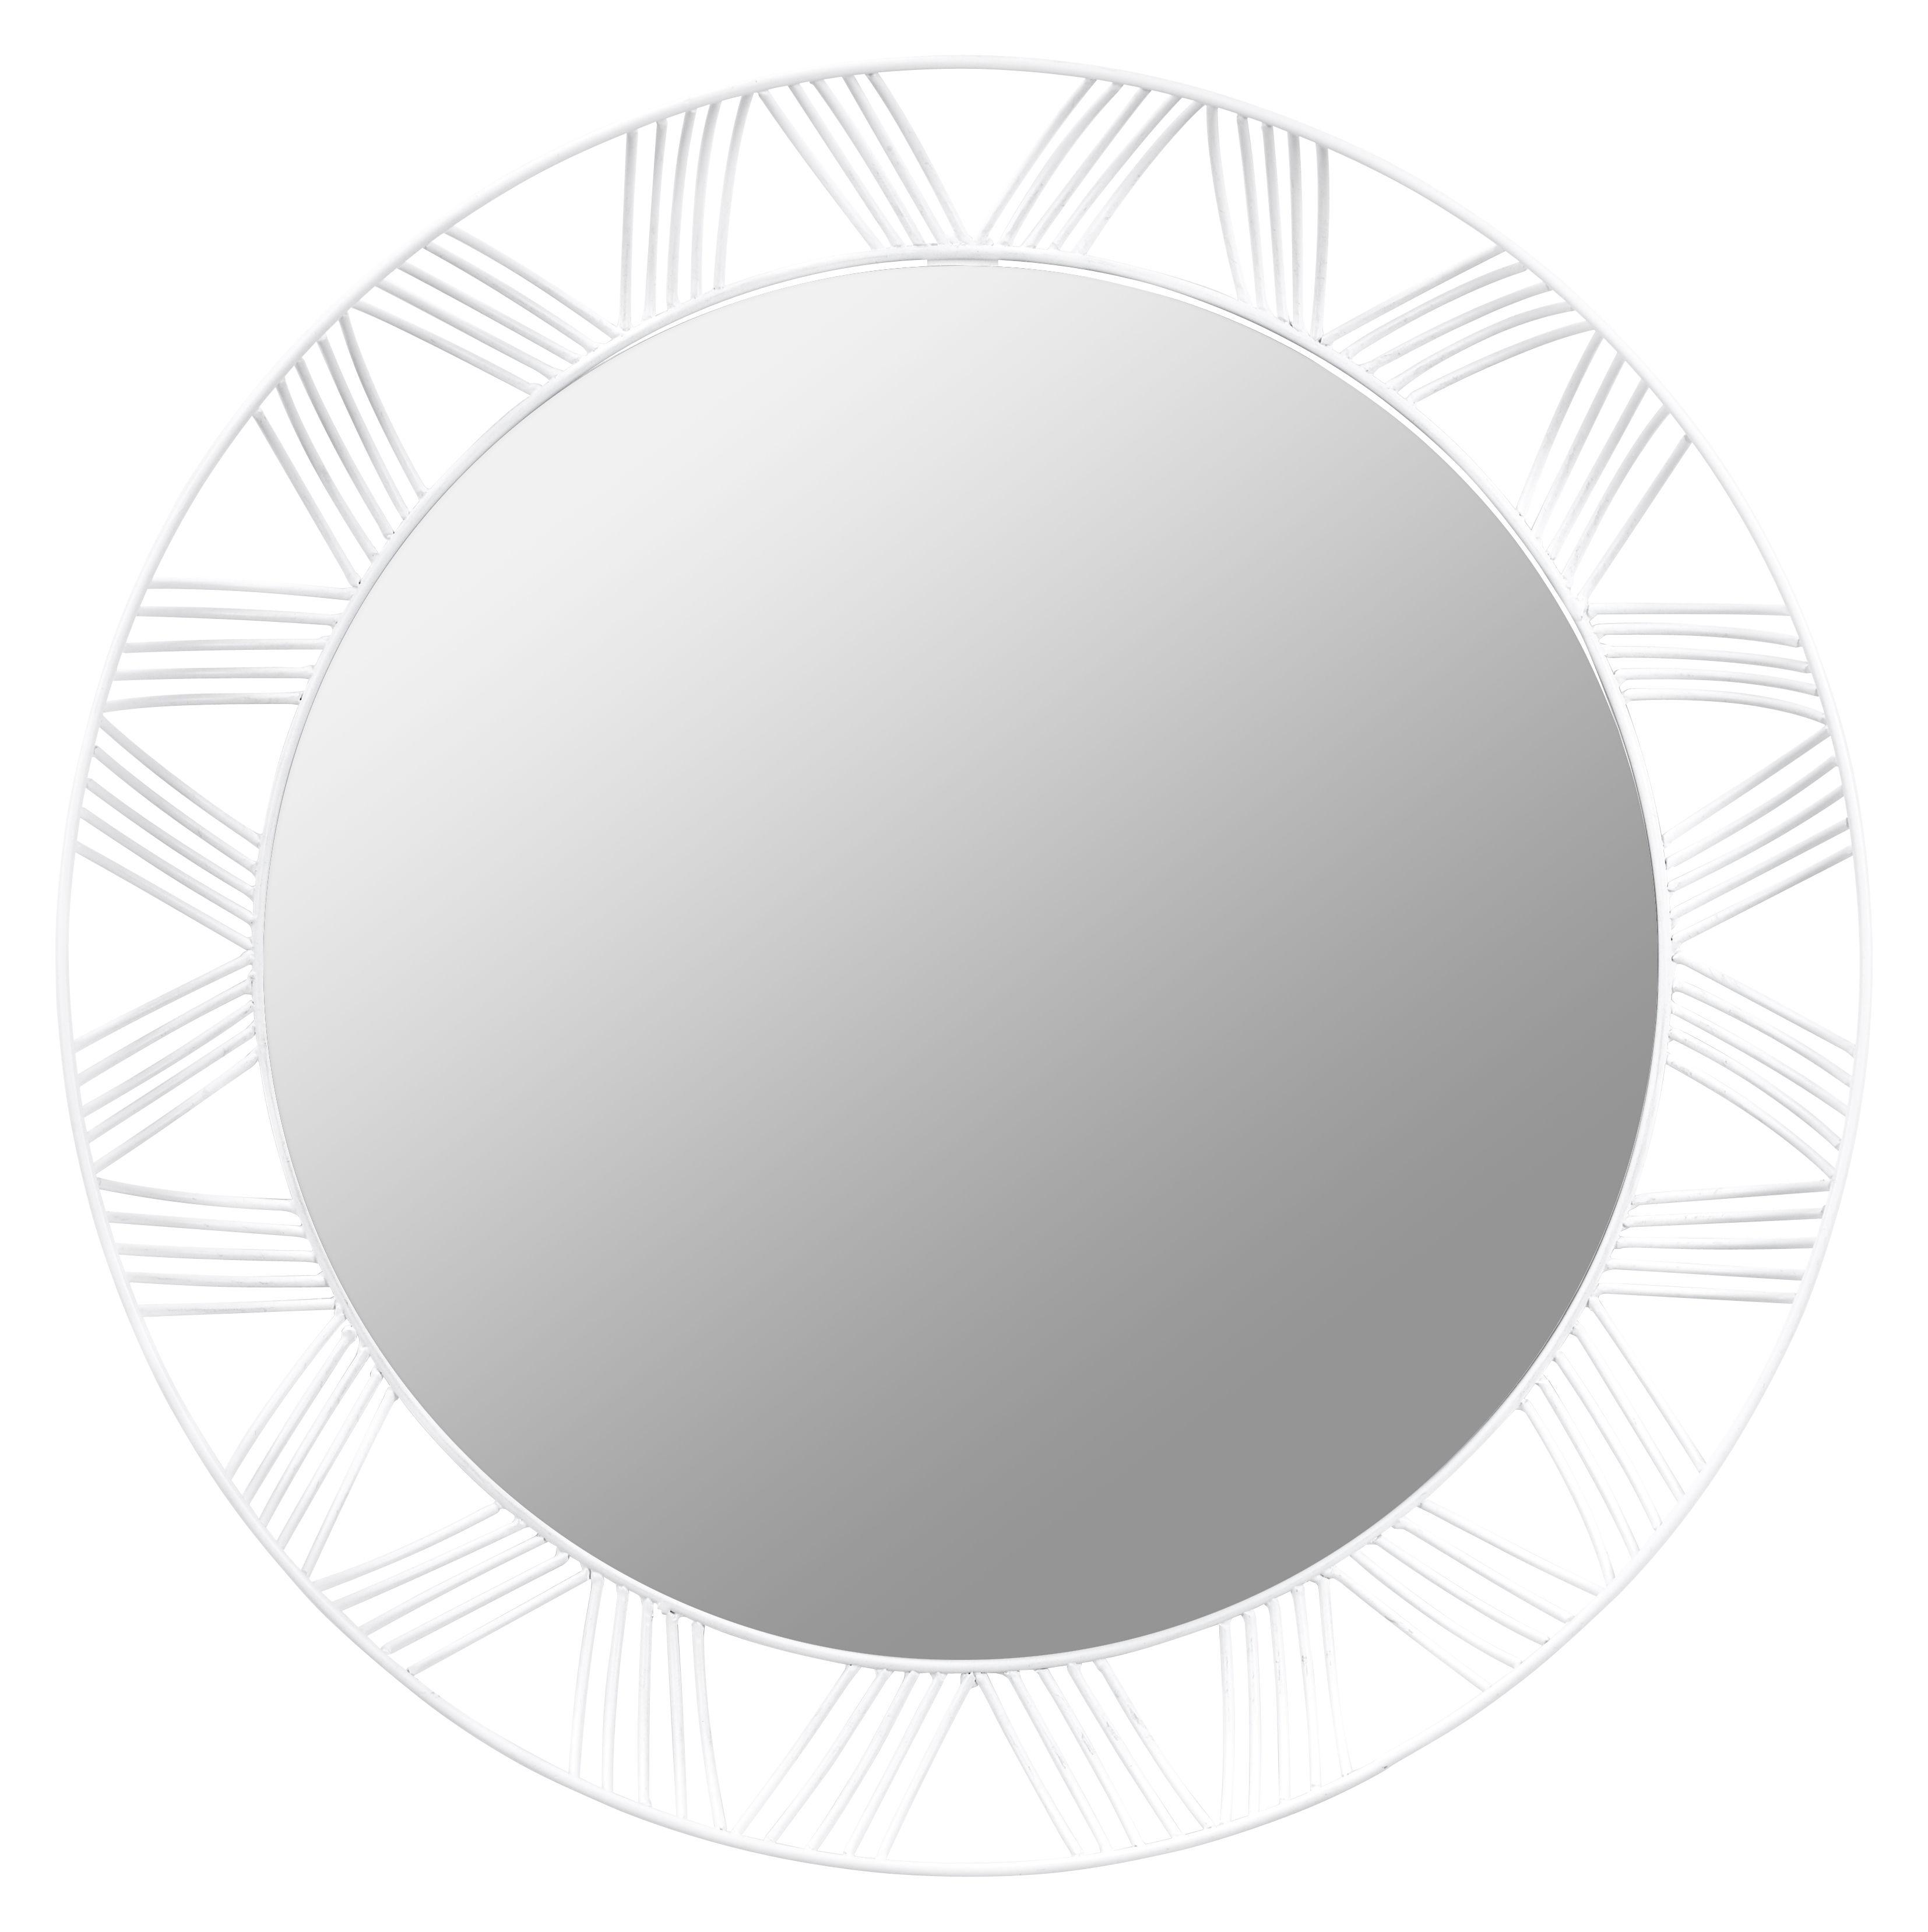 miroir mural stilk rond 50 cm blanc serax made in design. Black Bedroom Furniture Sets. Home Design Ideas